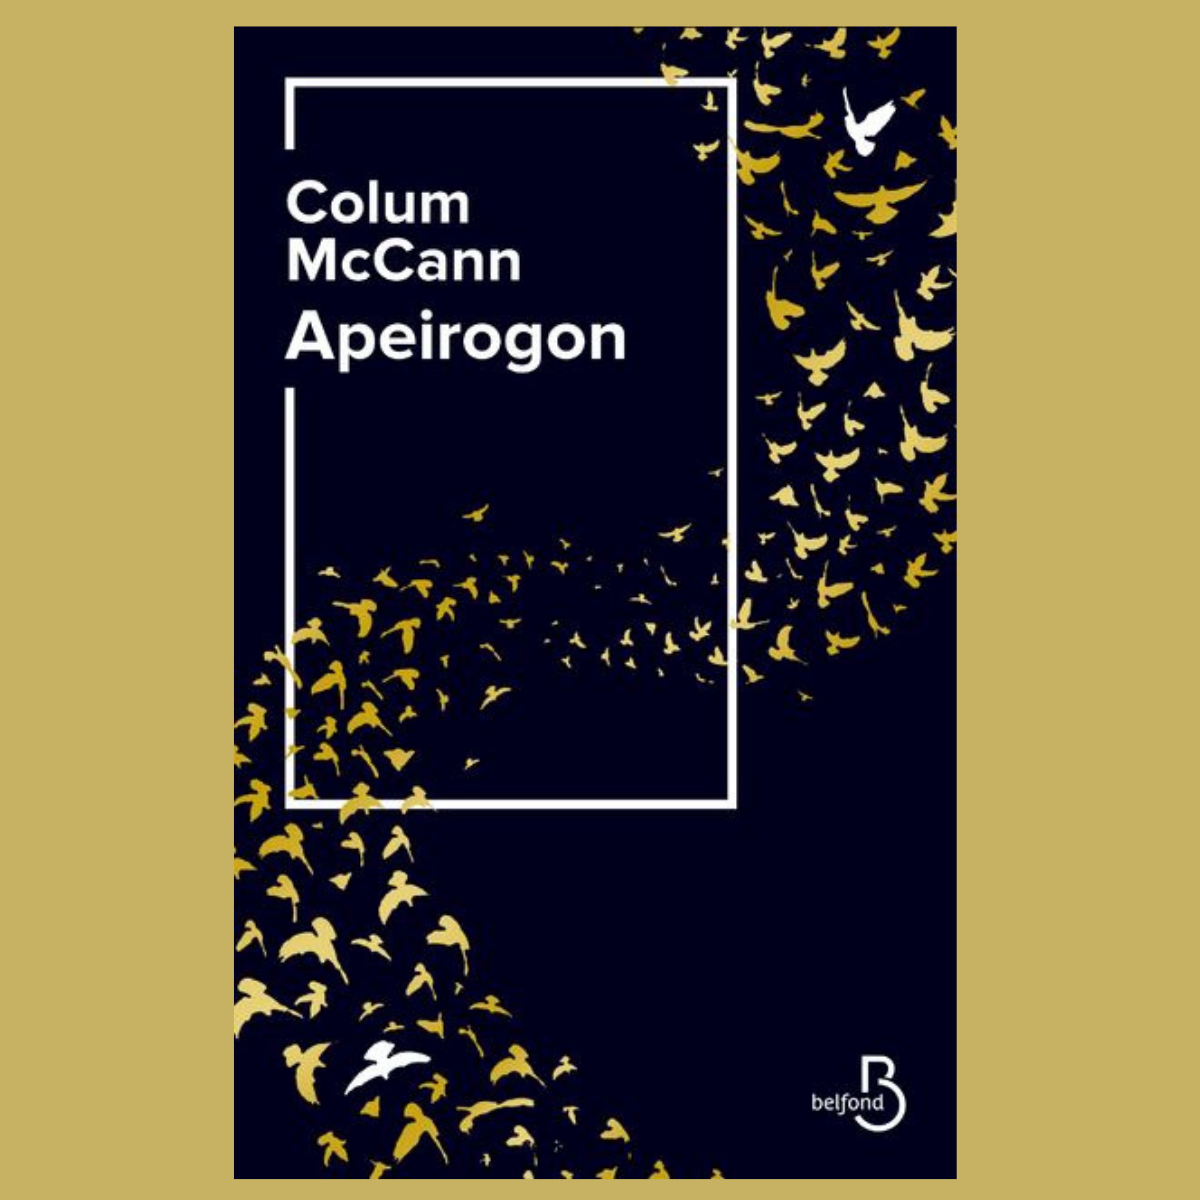 Apeirogon - Colum McCann (éd. Belfond)